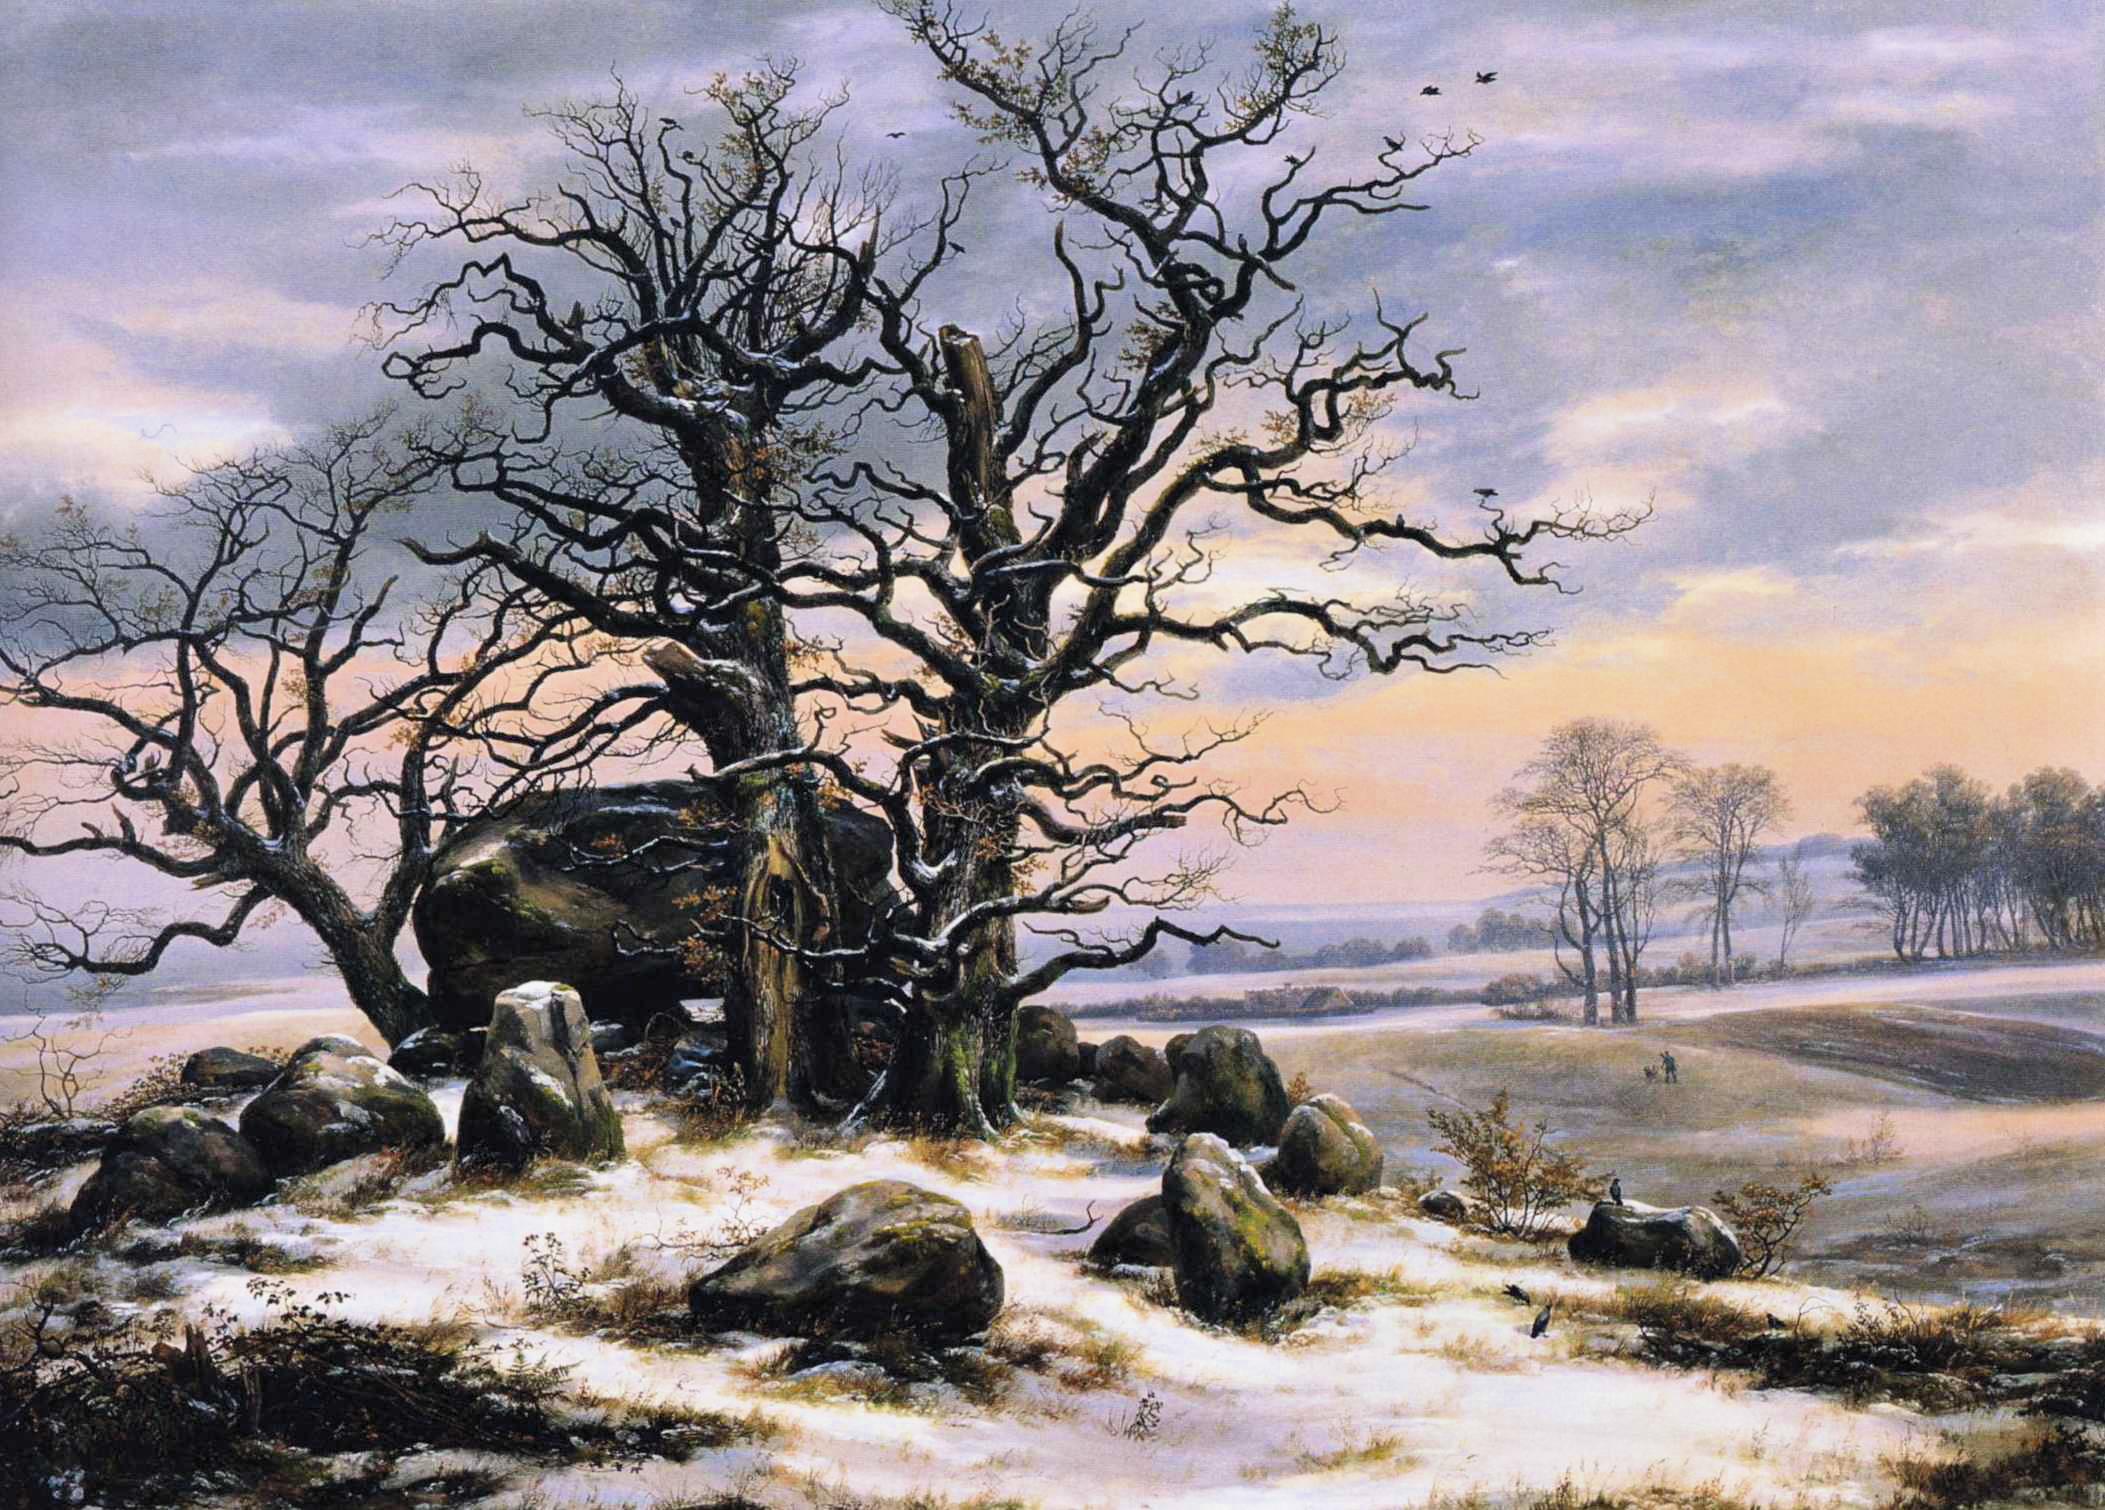 Johan_Christian_Dahl_-_Megalith_Grave_in_Winter